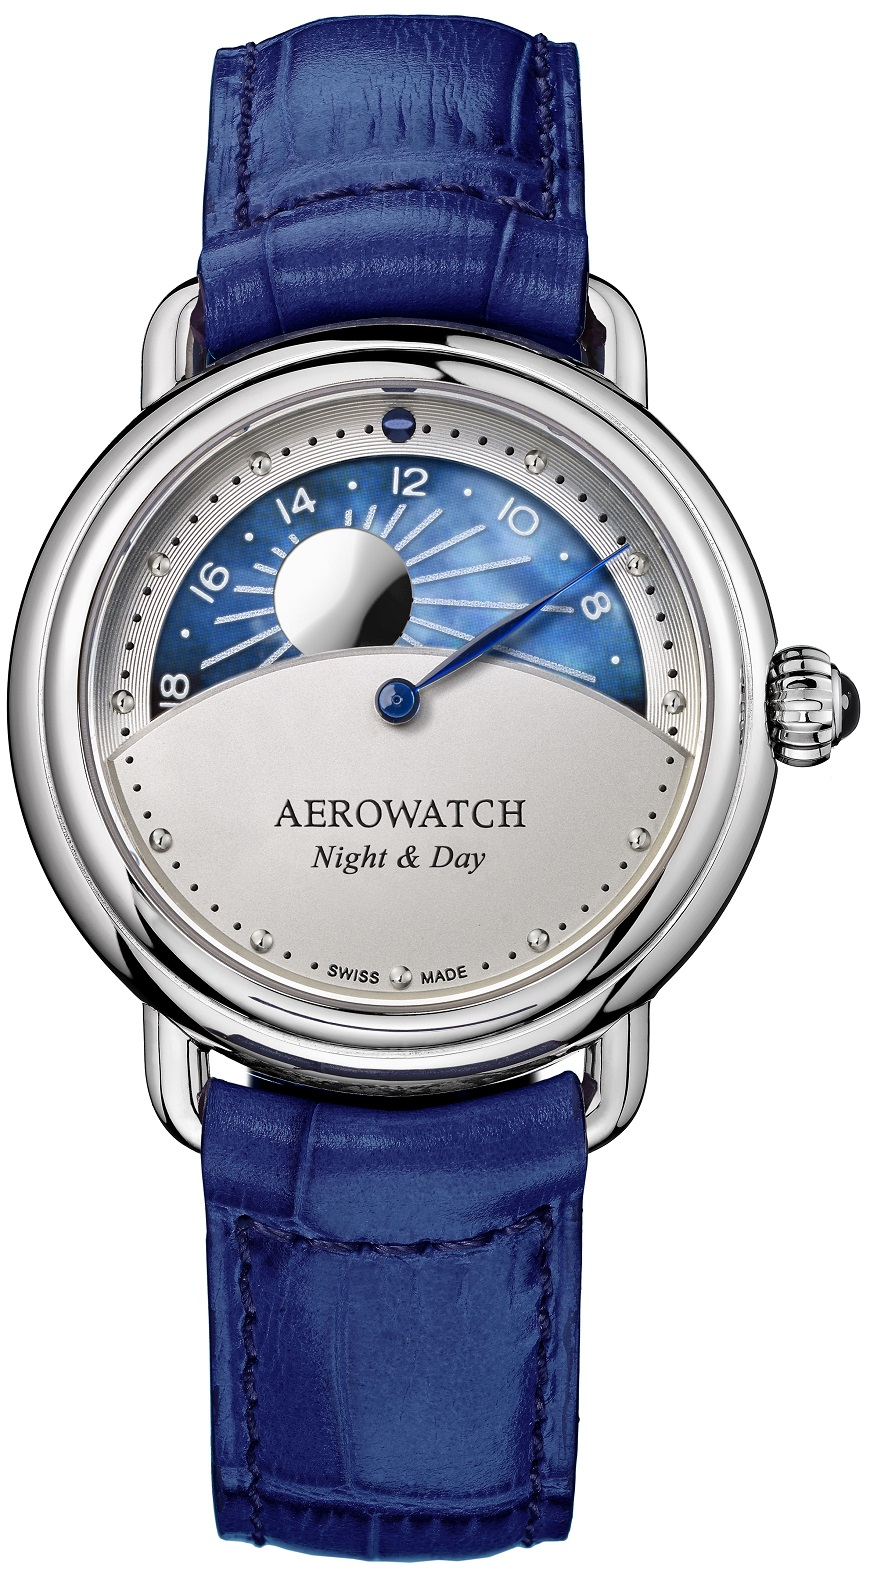 Aerowatch -1942-Night & Day-44960-AA10_volledig